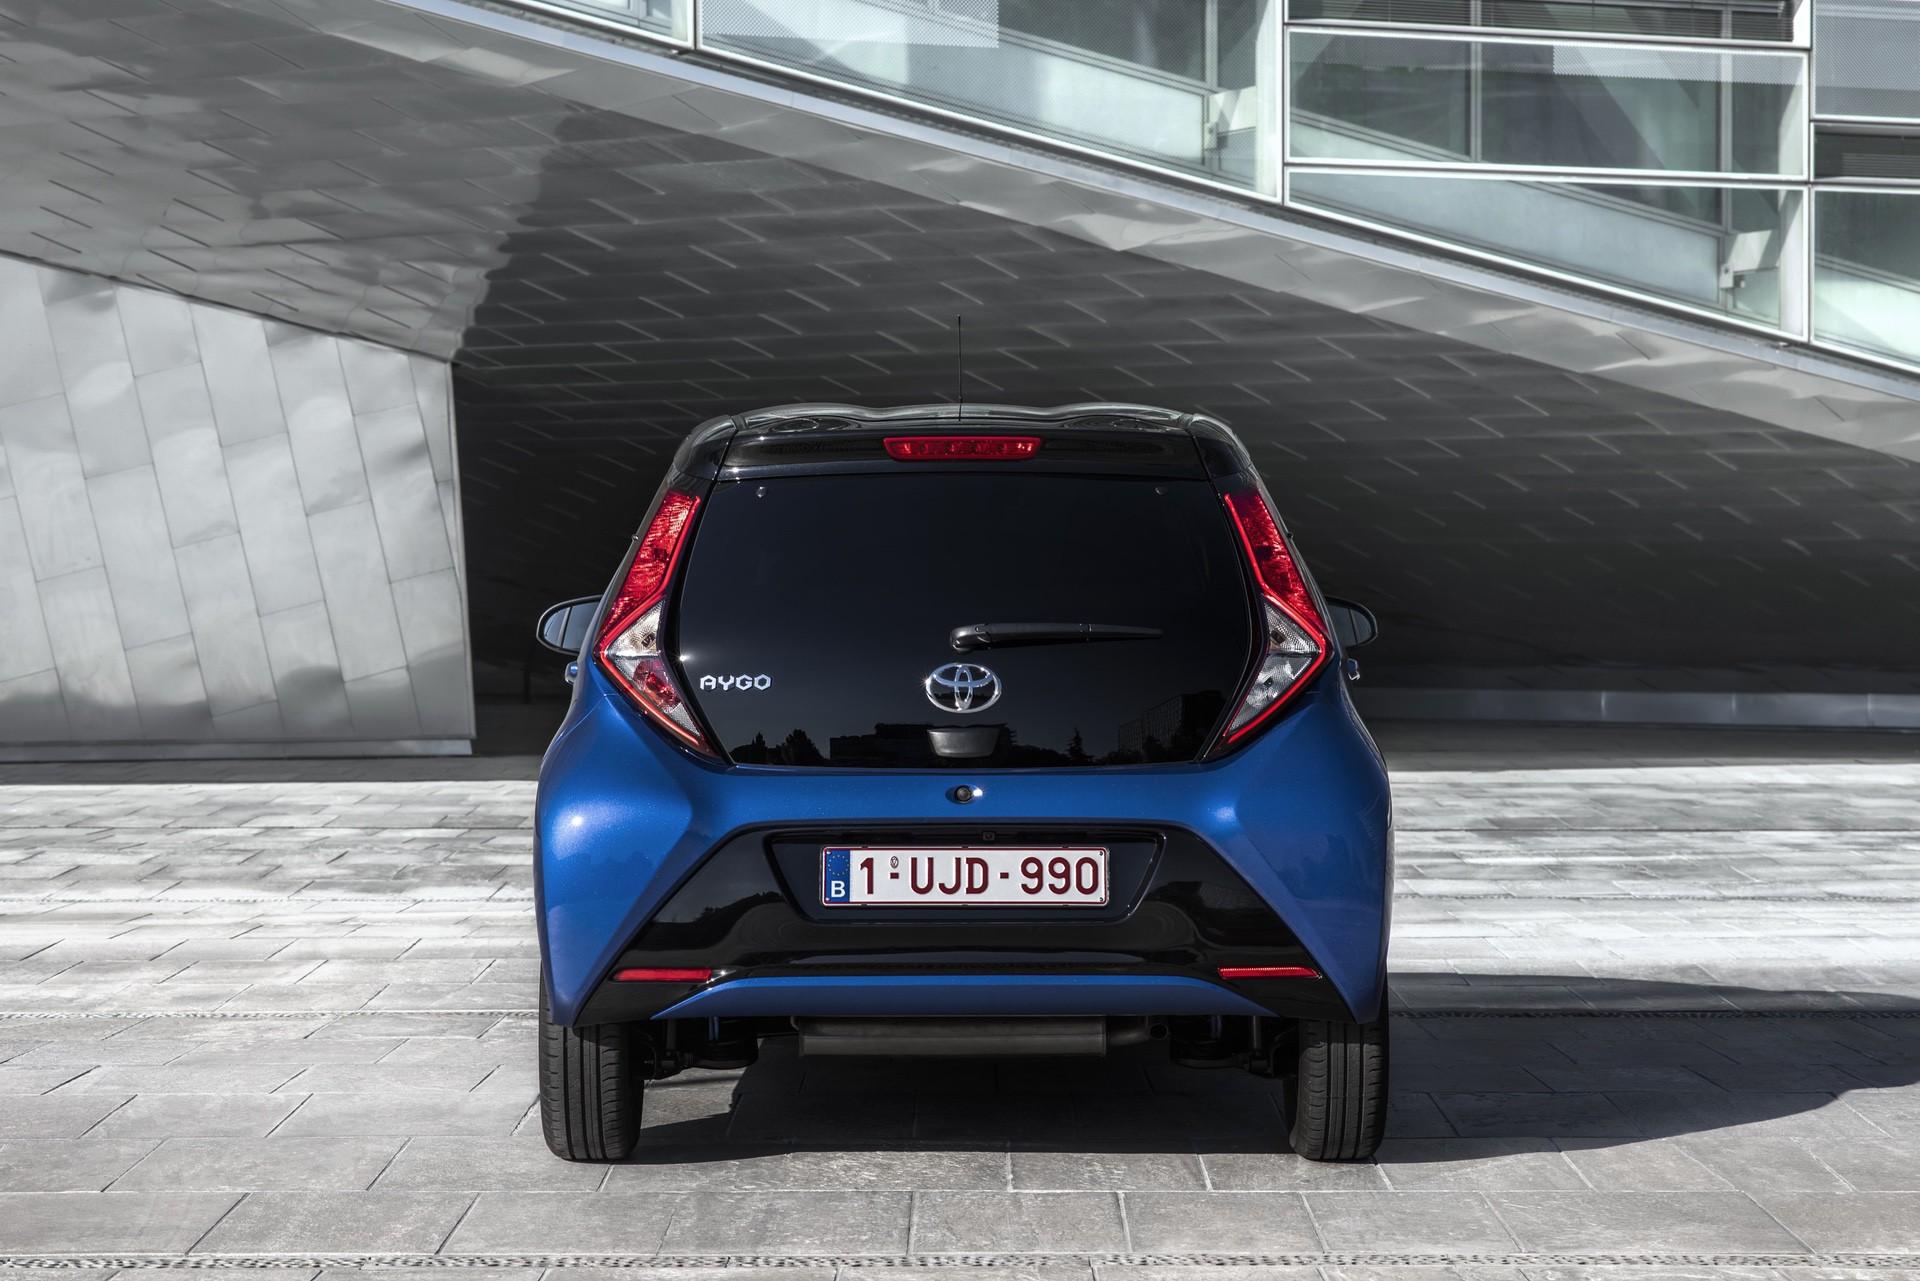 Toyota_Aygo_facelift_presskit_0031